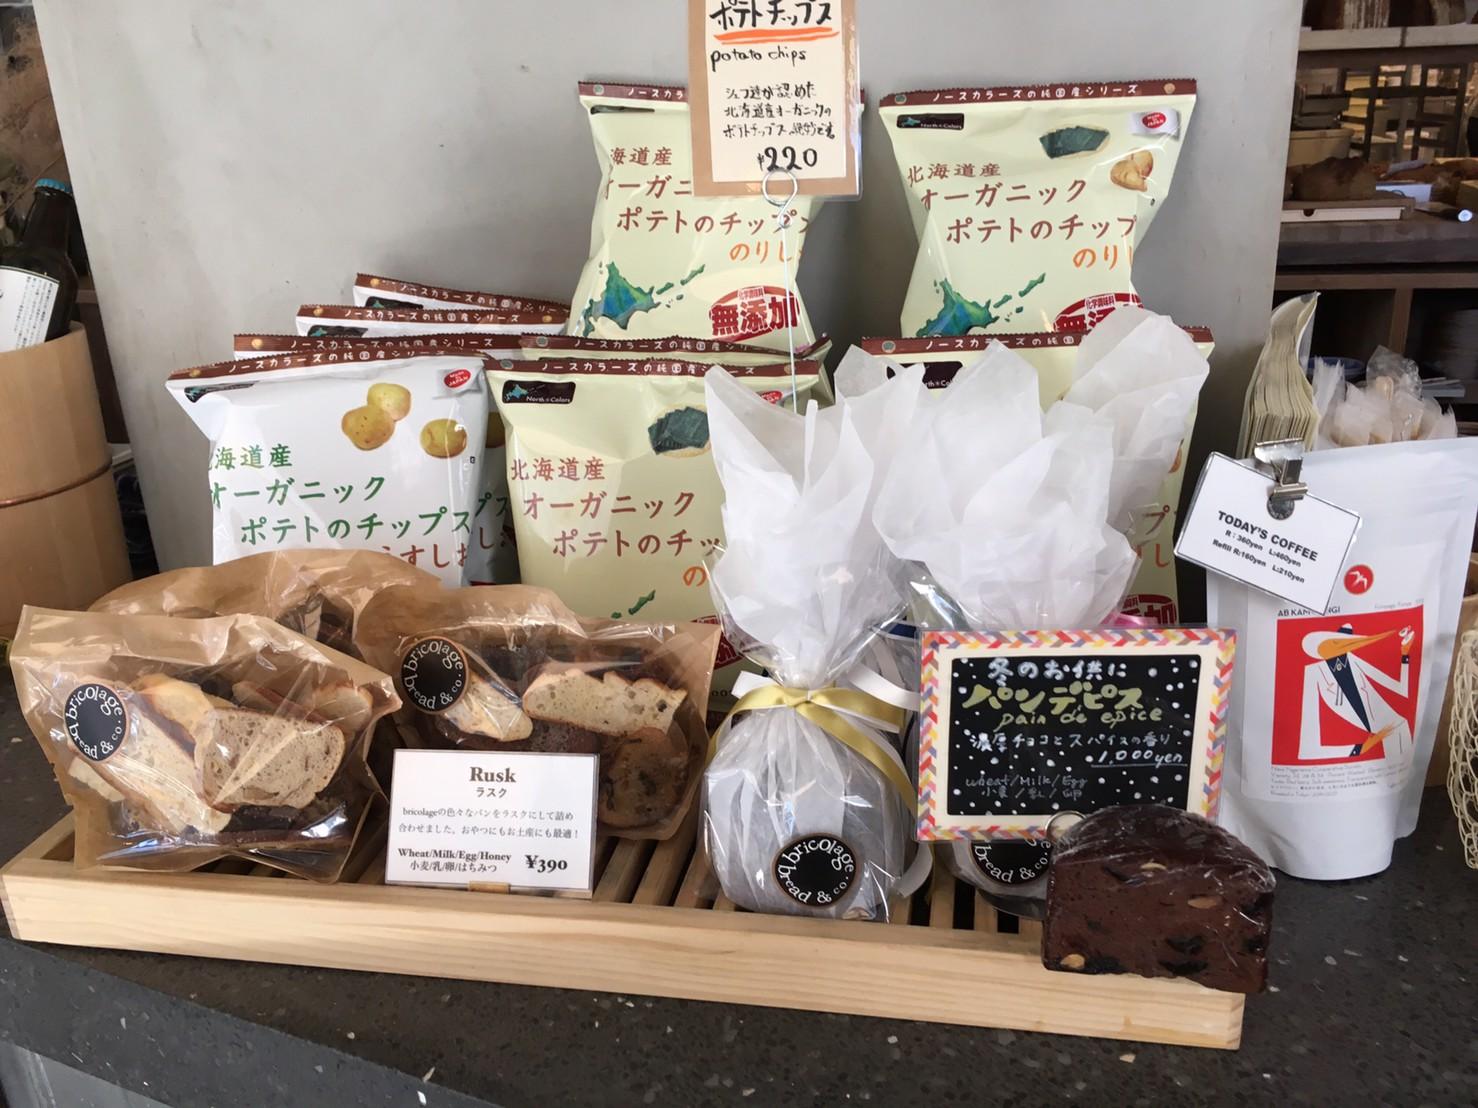 bricolage bread & co. カウンター お菓子